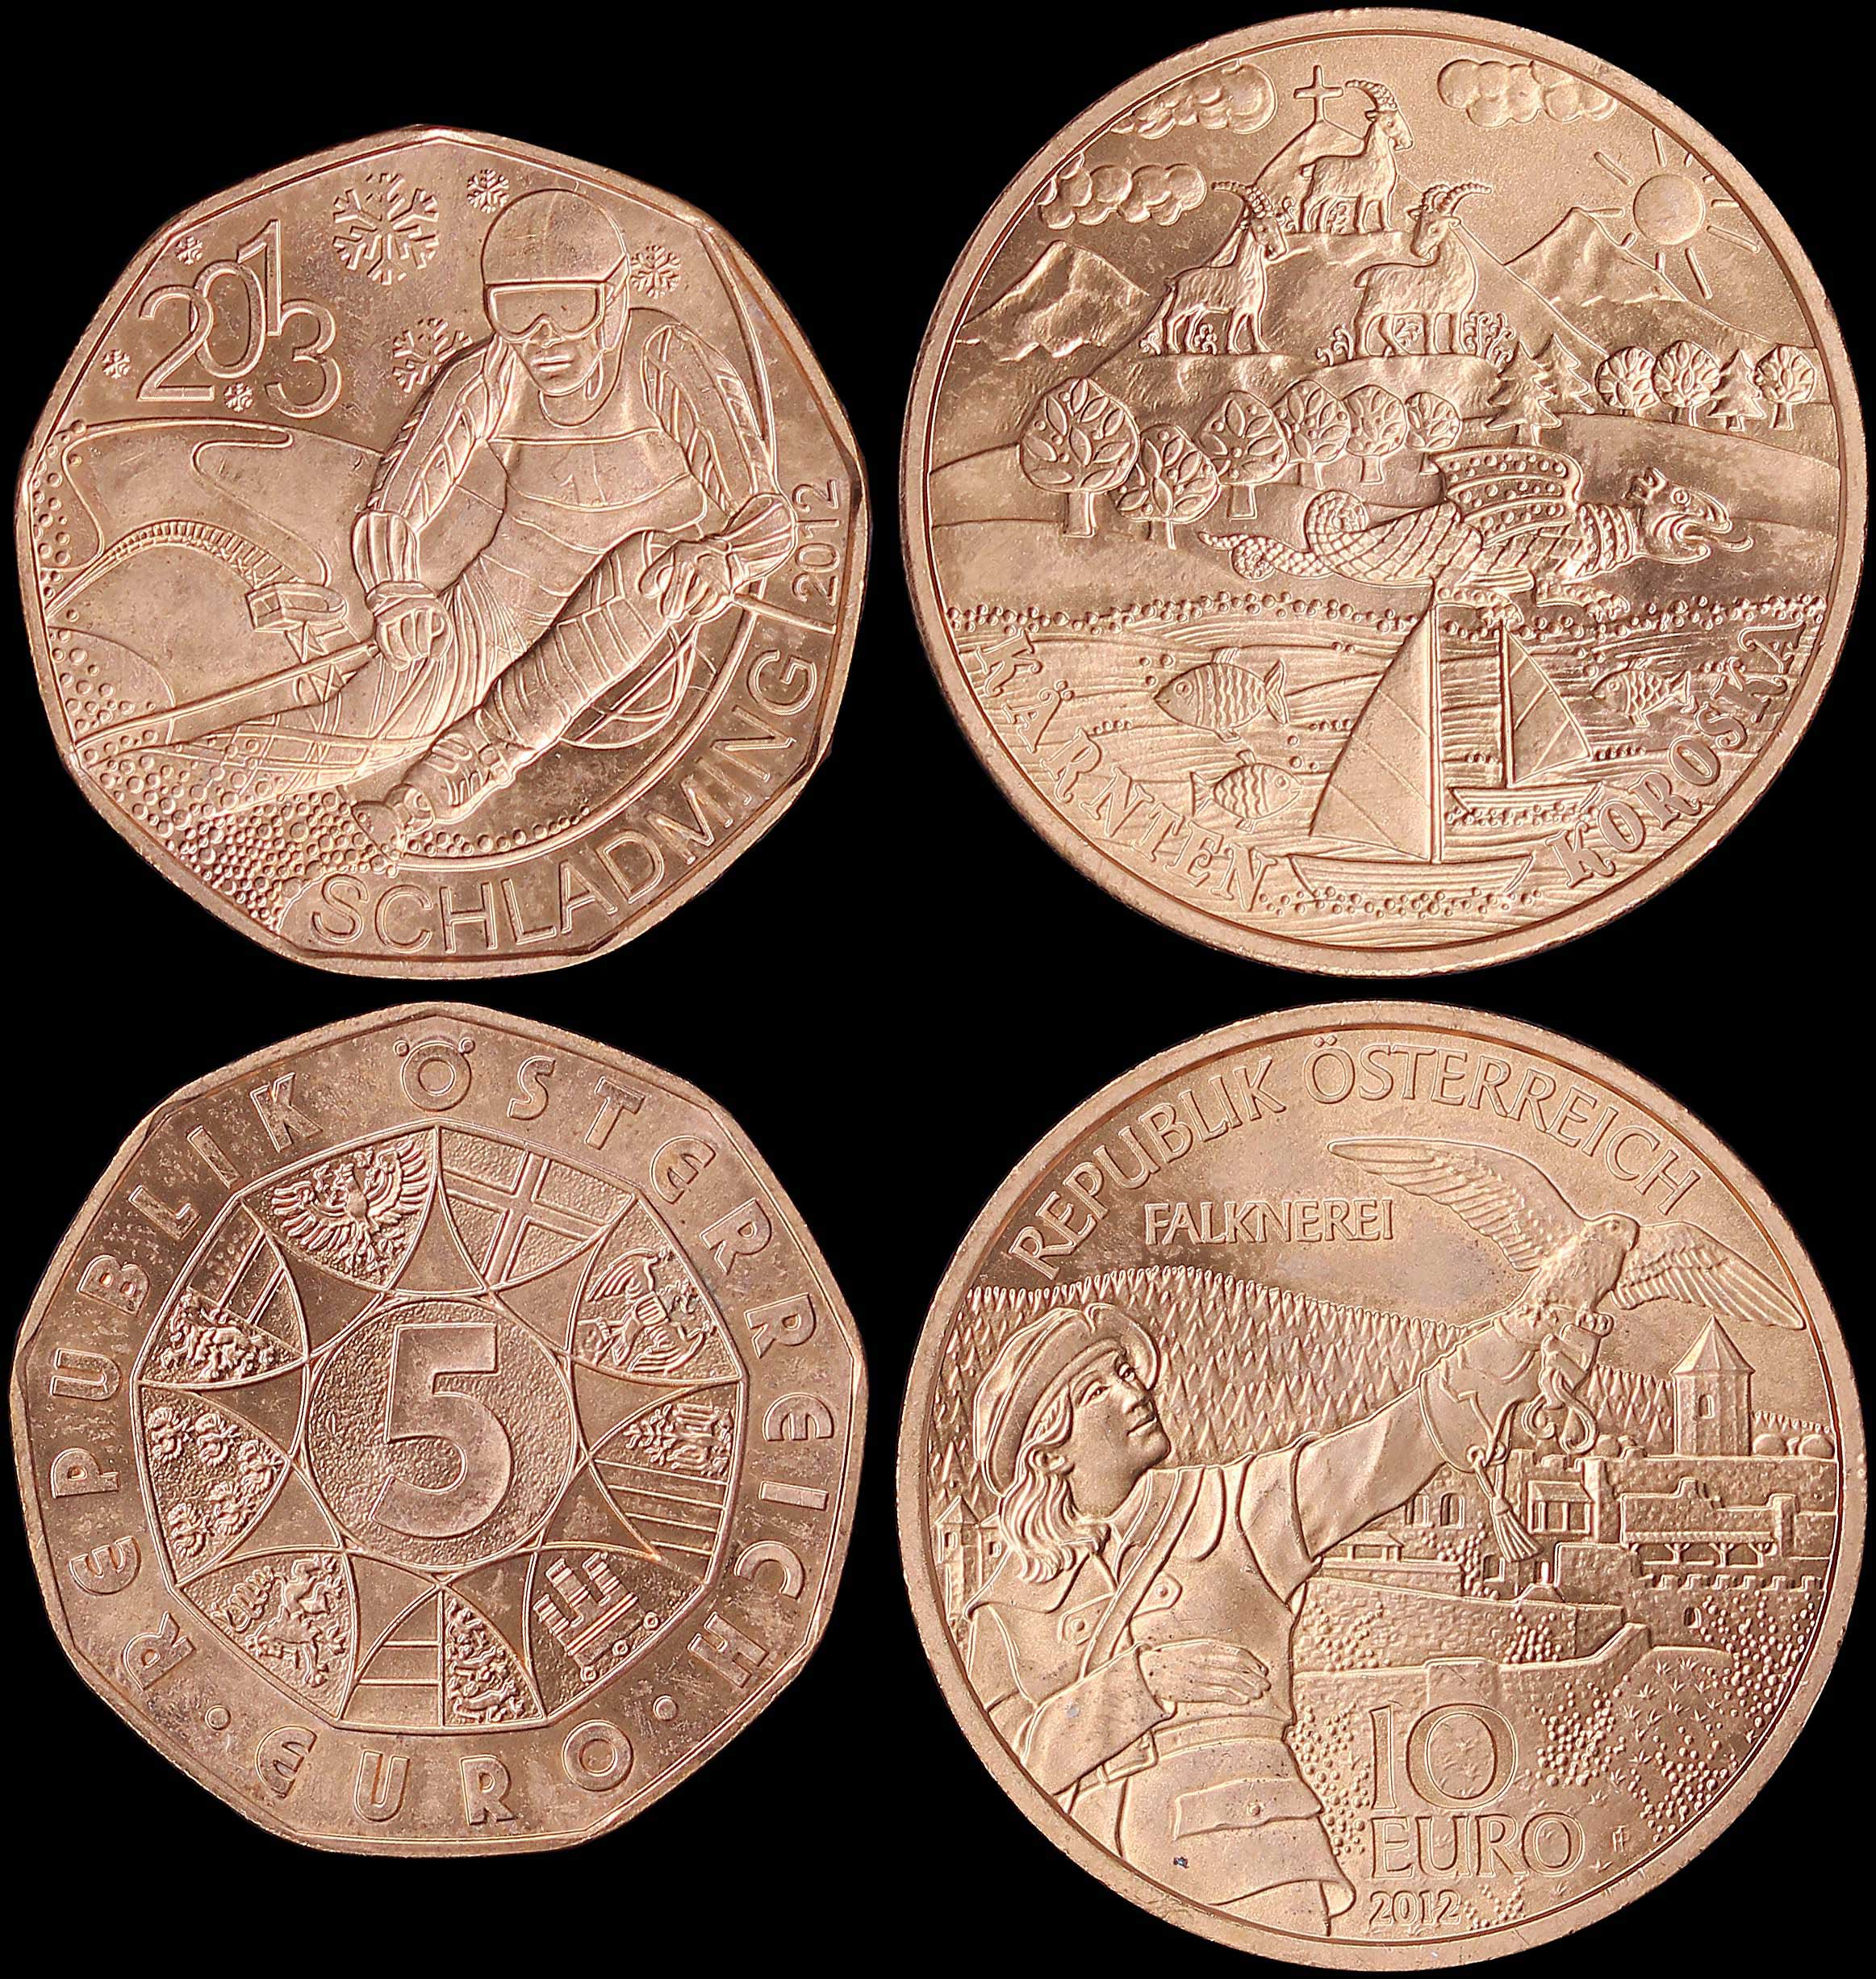 Lot 6793 - -  COINS & TOKENS COINS & TOKENS OF EUROPEAN COUNTRIES -  A. Karamitsos Postal & Live Internet Auction 984 (Part B)